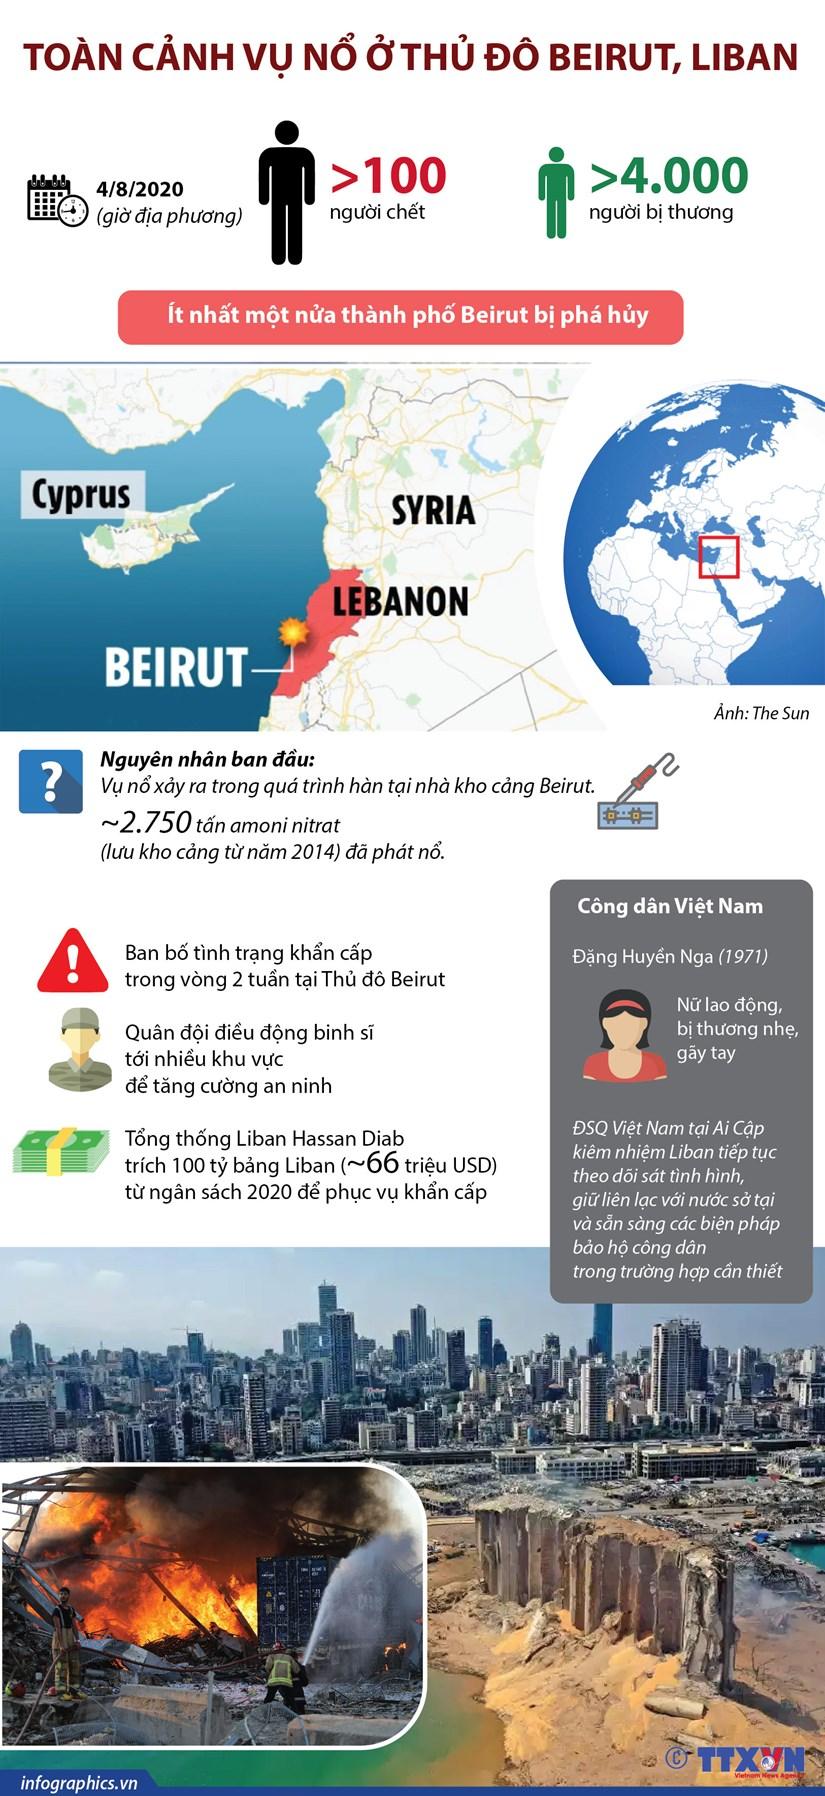 [Infographics] Toan canh vu no kinh hoang o thu do Beirut hinh anh 1